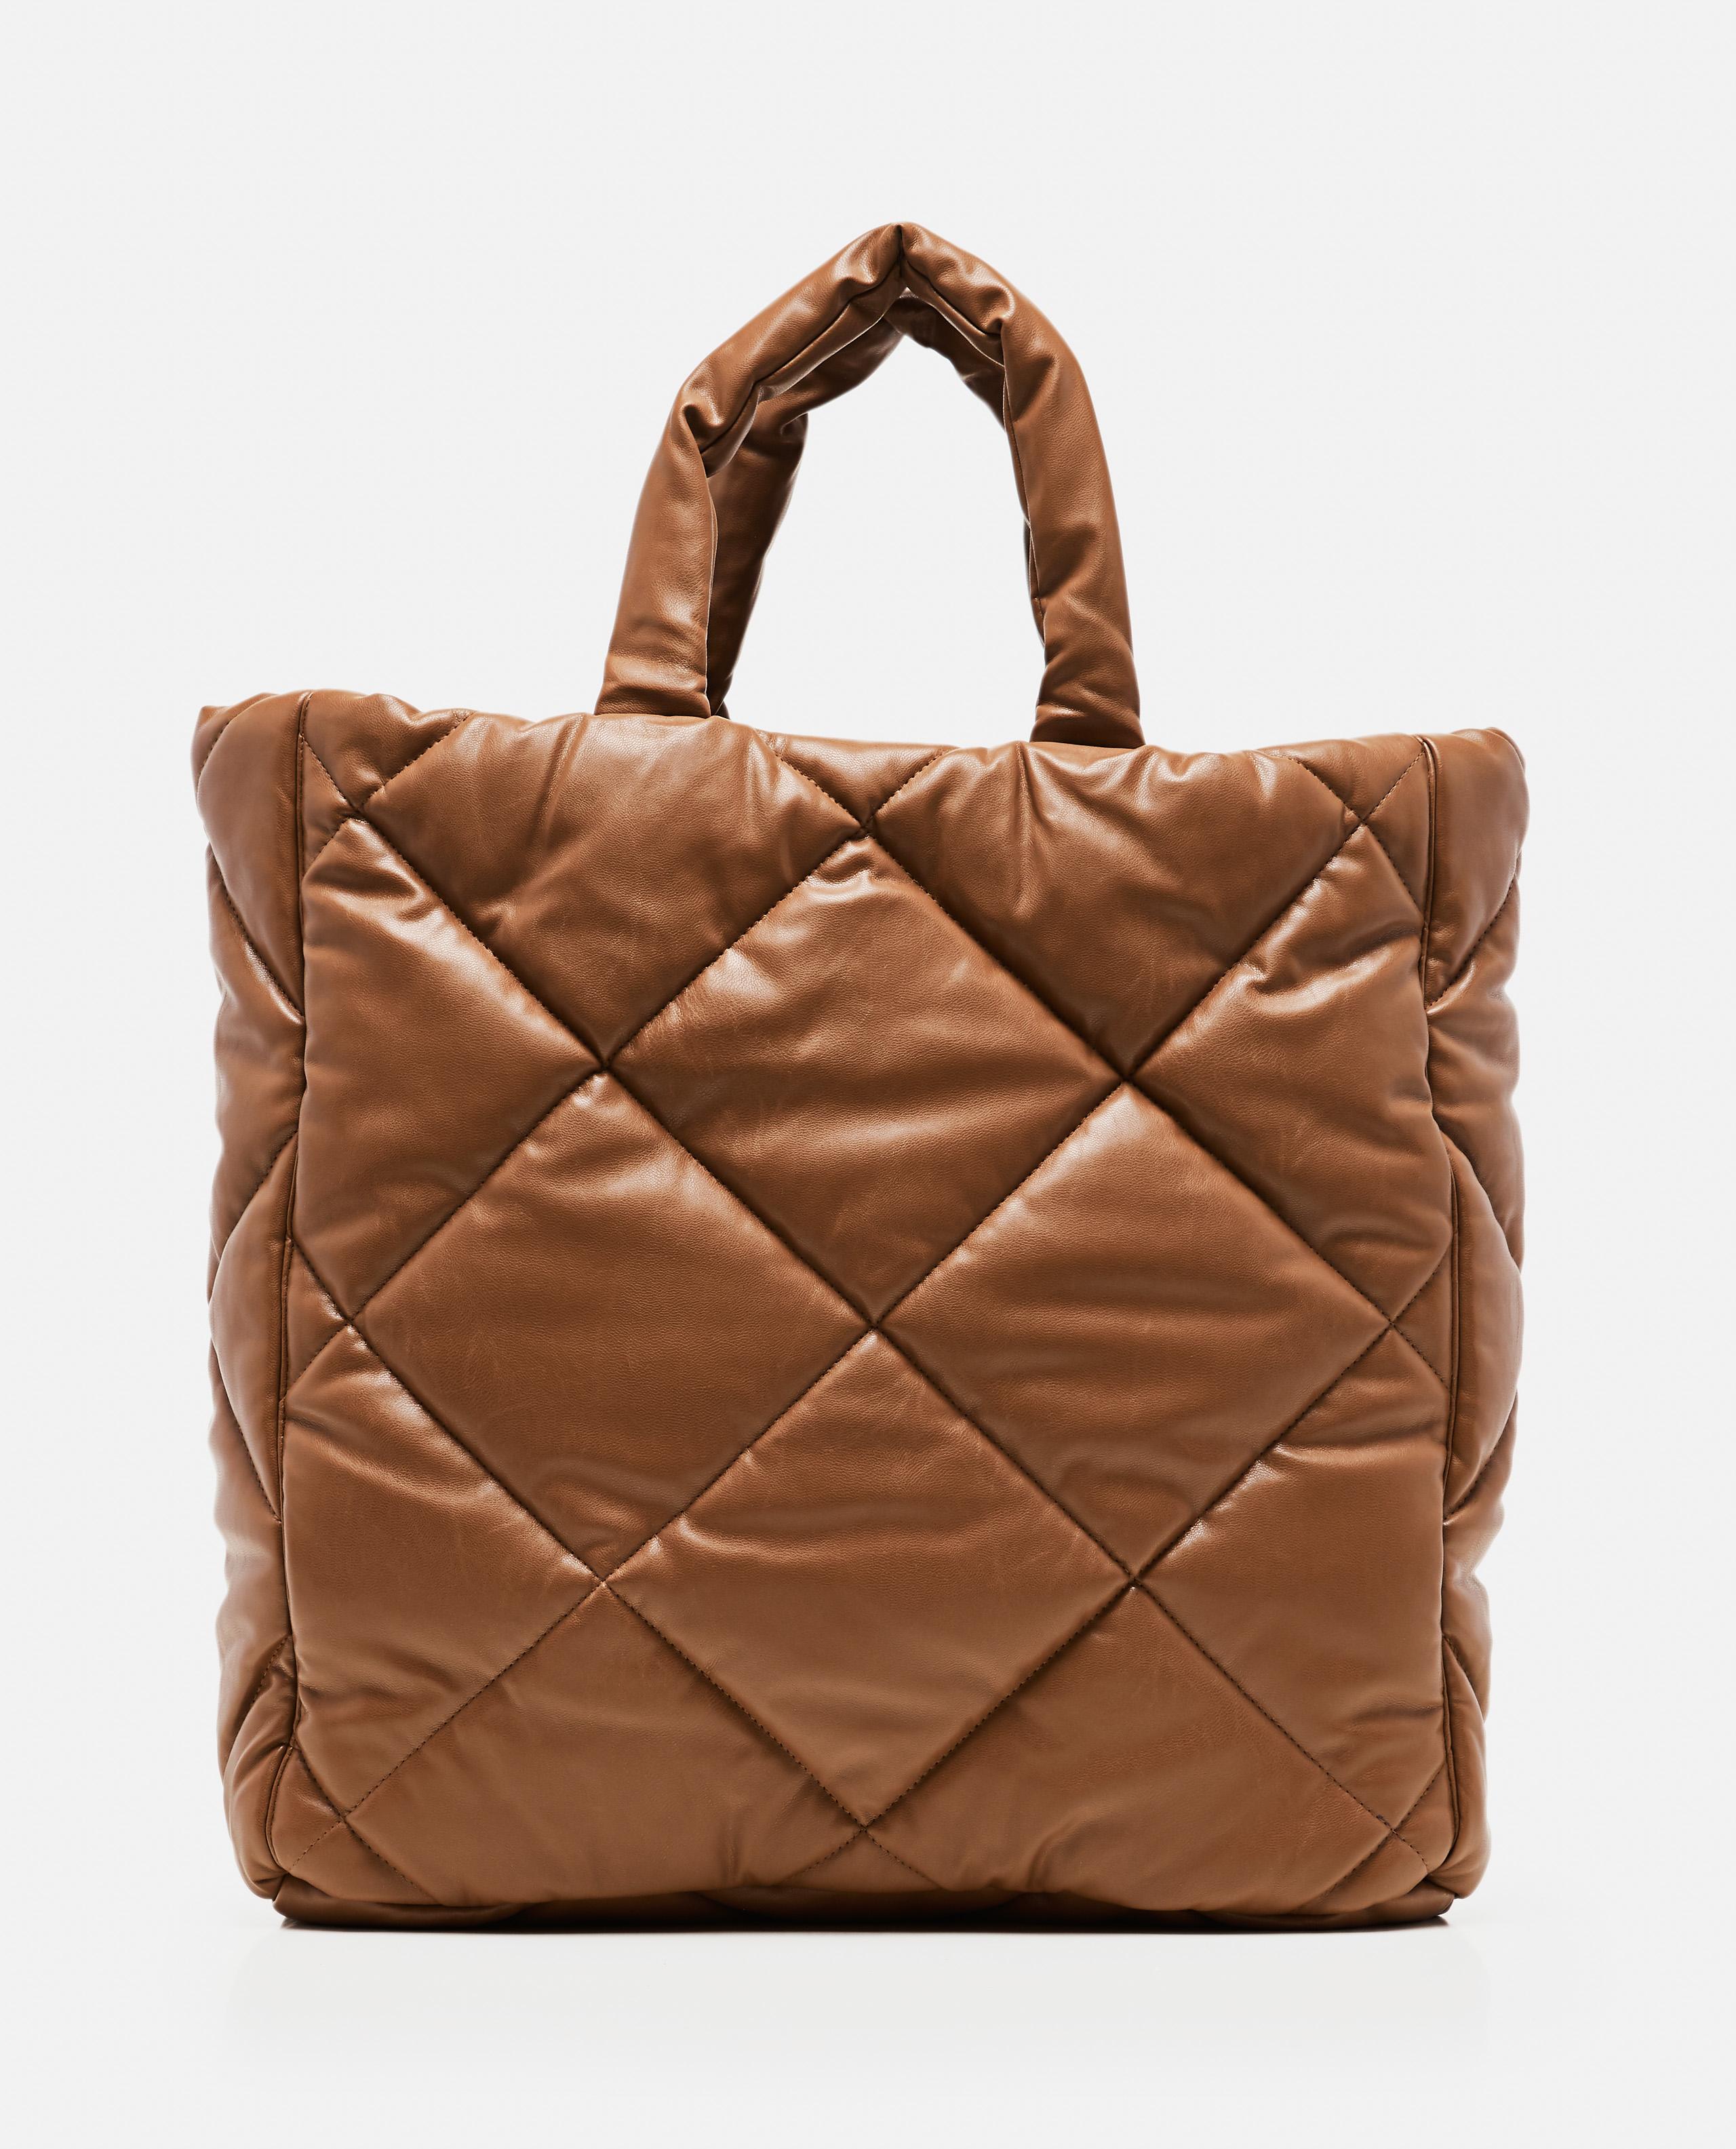 Assante Diamond Tote Bag